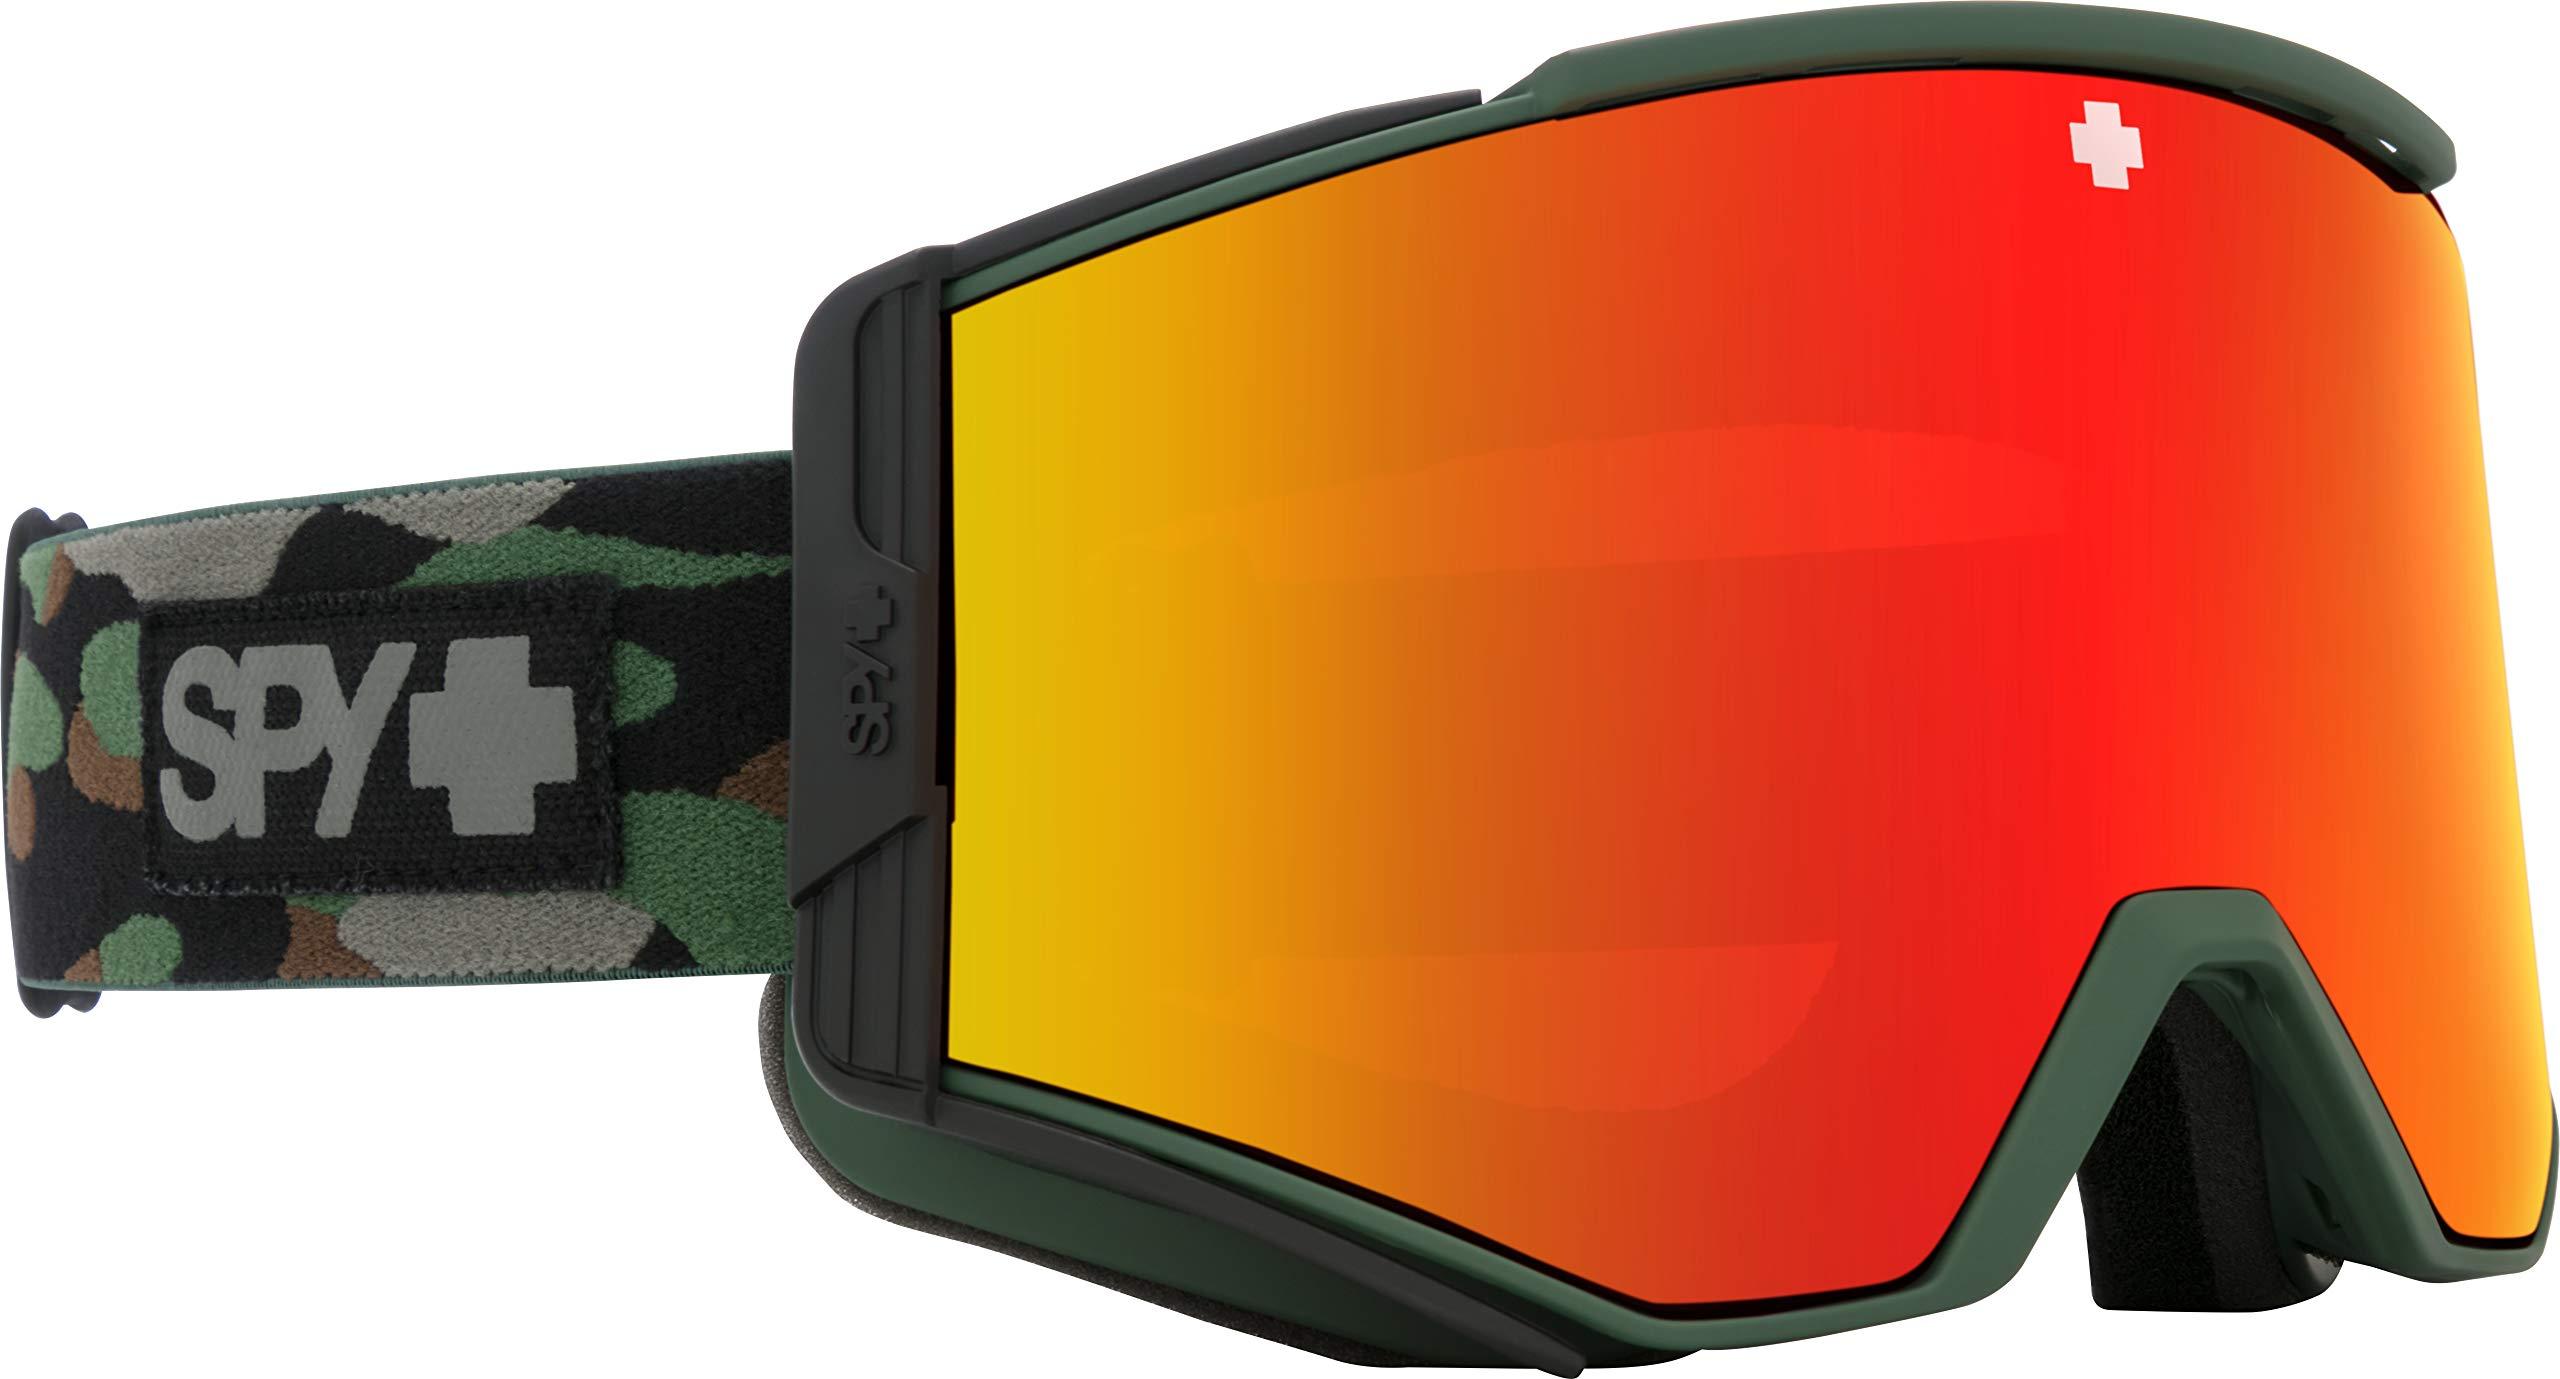 SPY Optic Ace Snow Goggles